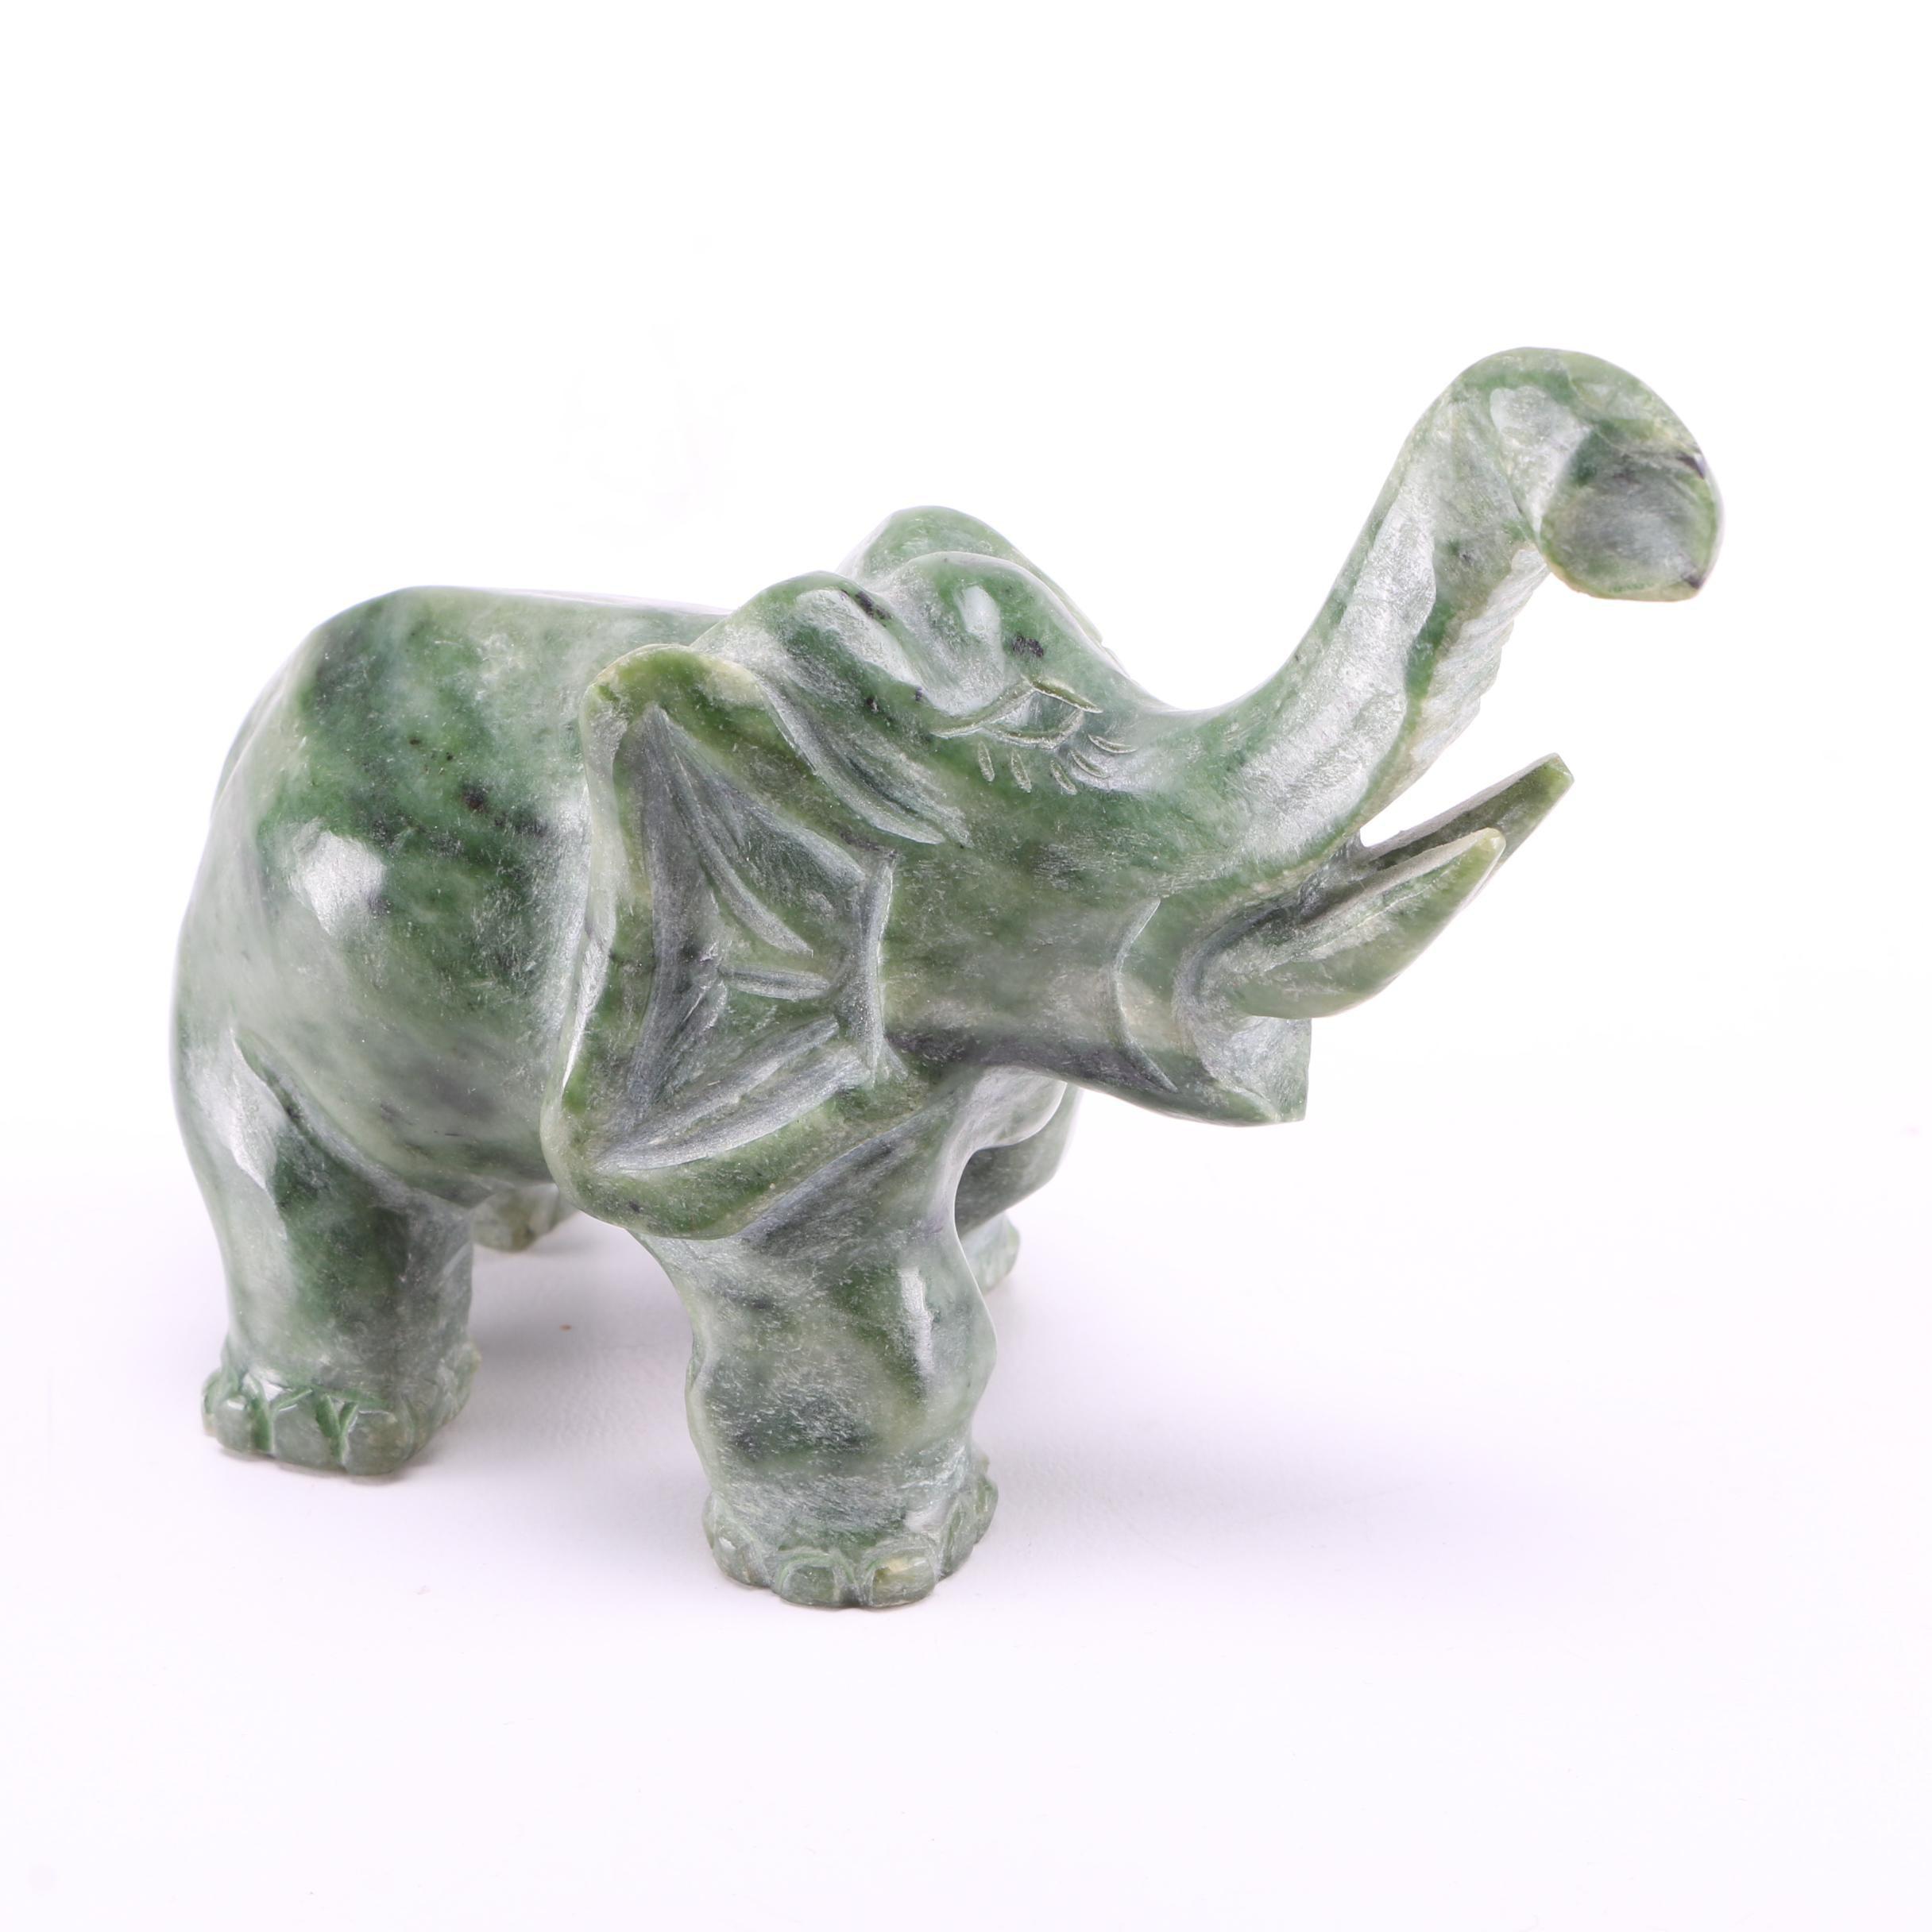 Green Soapstone Elephant Figurine